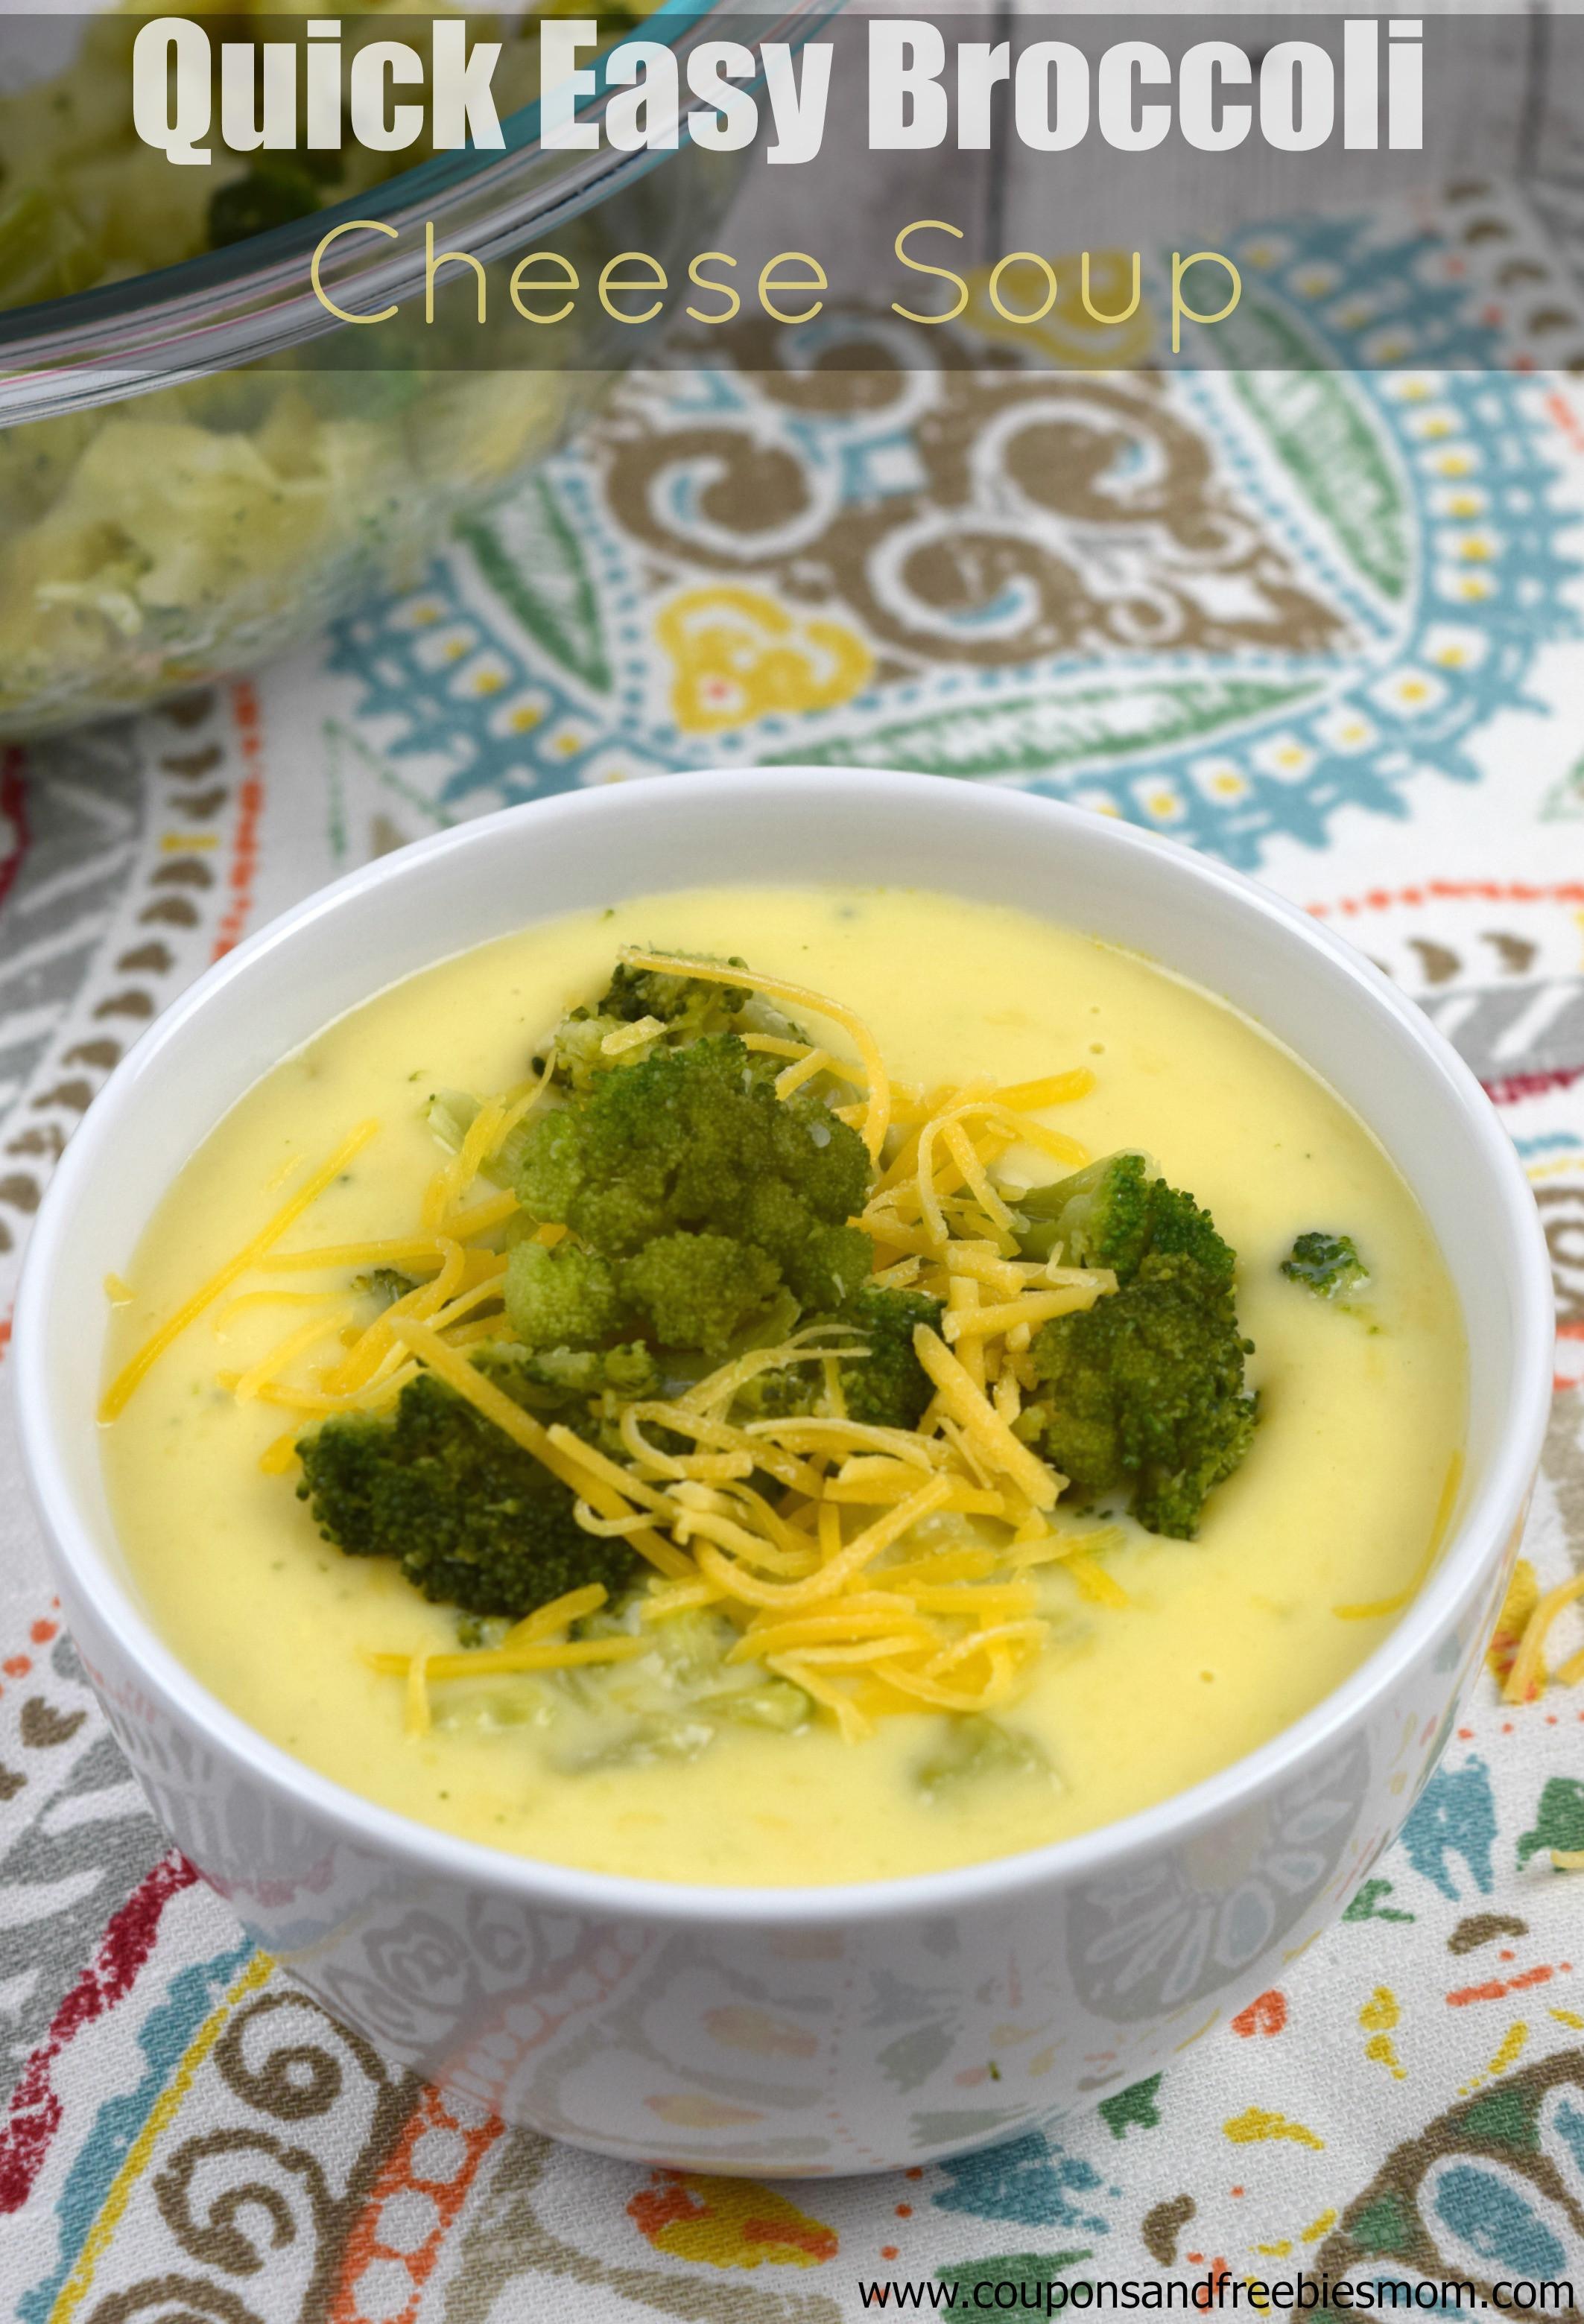 Easy Broccoli Cheese Soup  Quick Easy Broccoli Cheese Soup